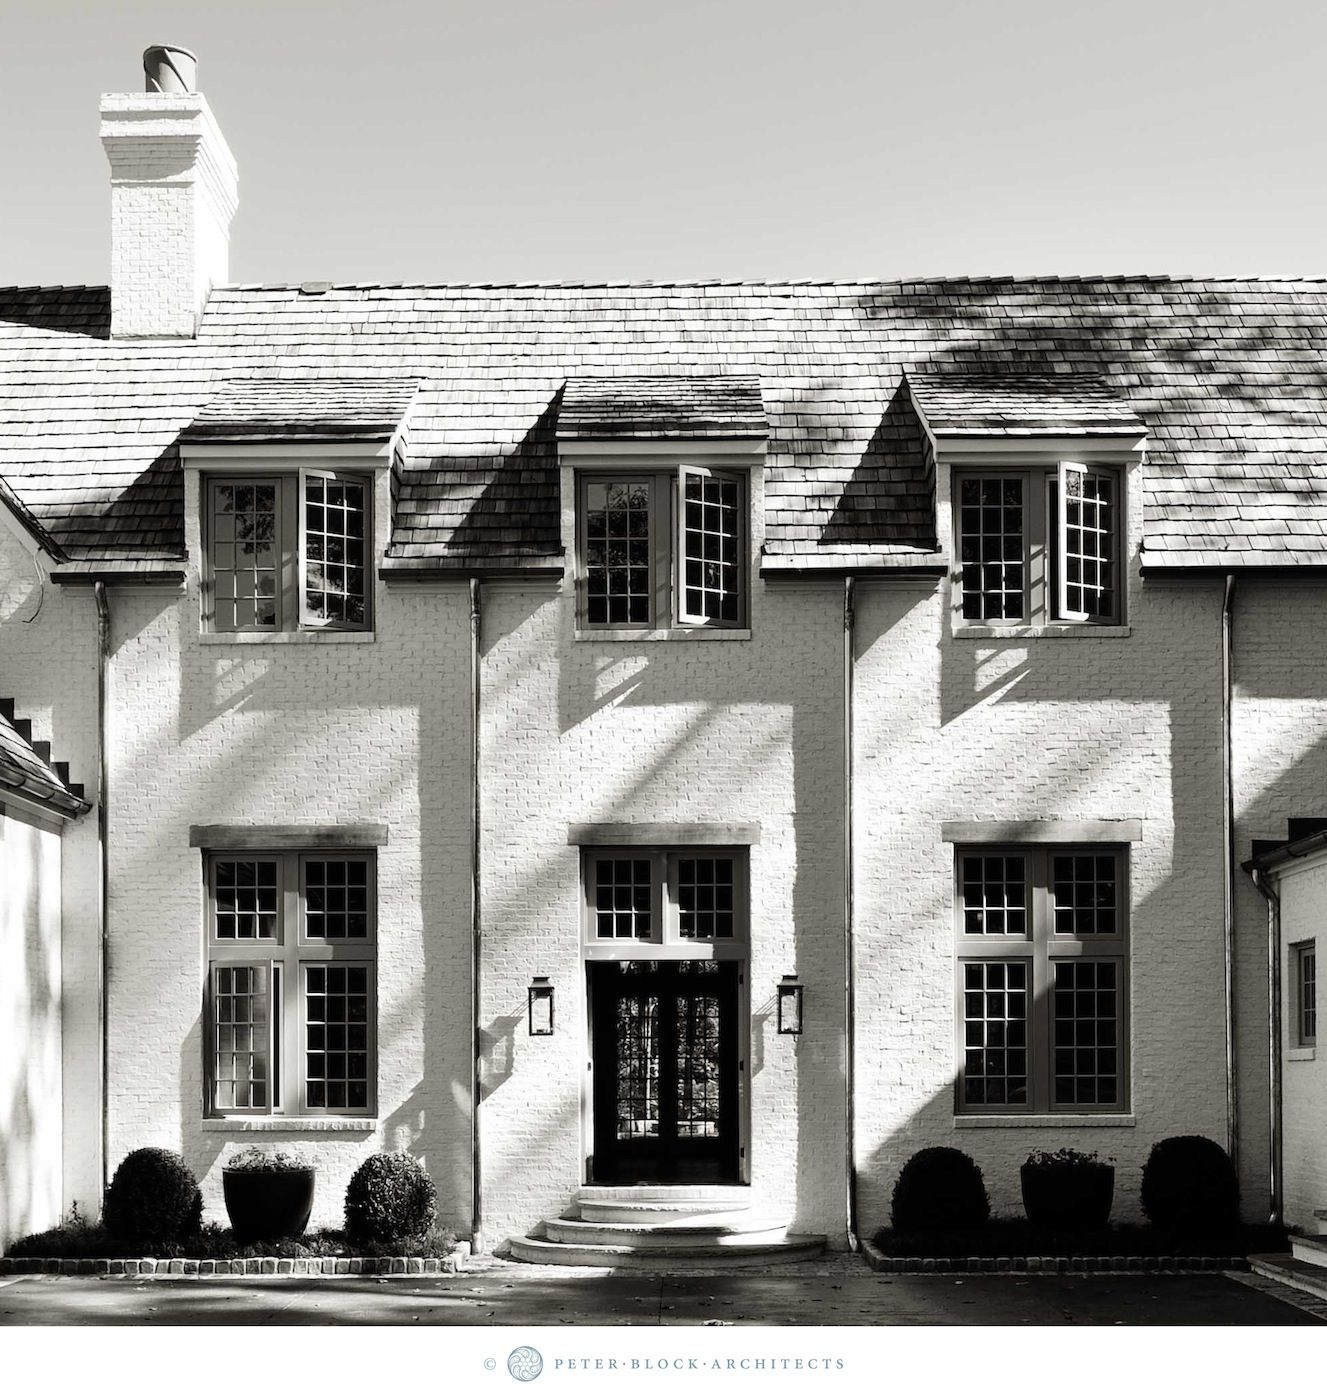 Atlanta S Premiere Landscape Architect: Peter Block Architects Is A Boutique Architecture Firm In